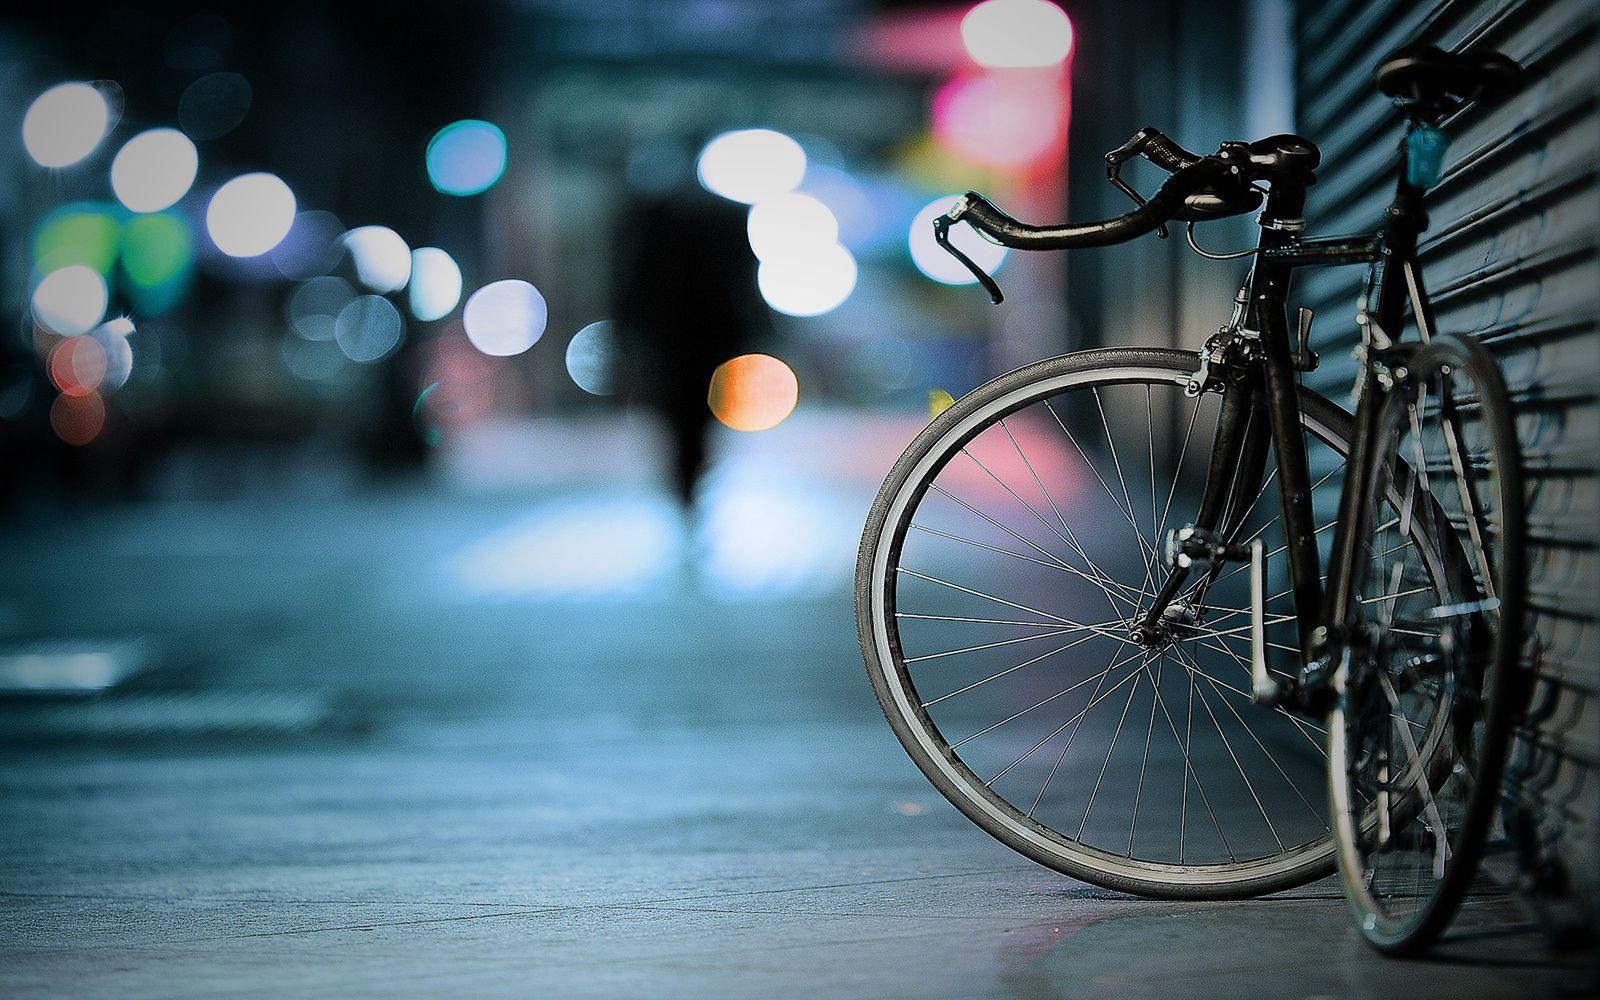 Bicyclette - Nuit - Rue - Lumières - Wallpaper - Free